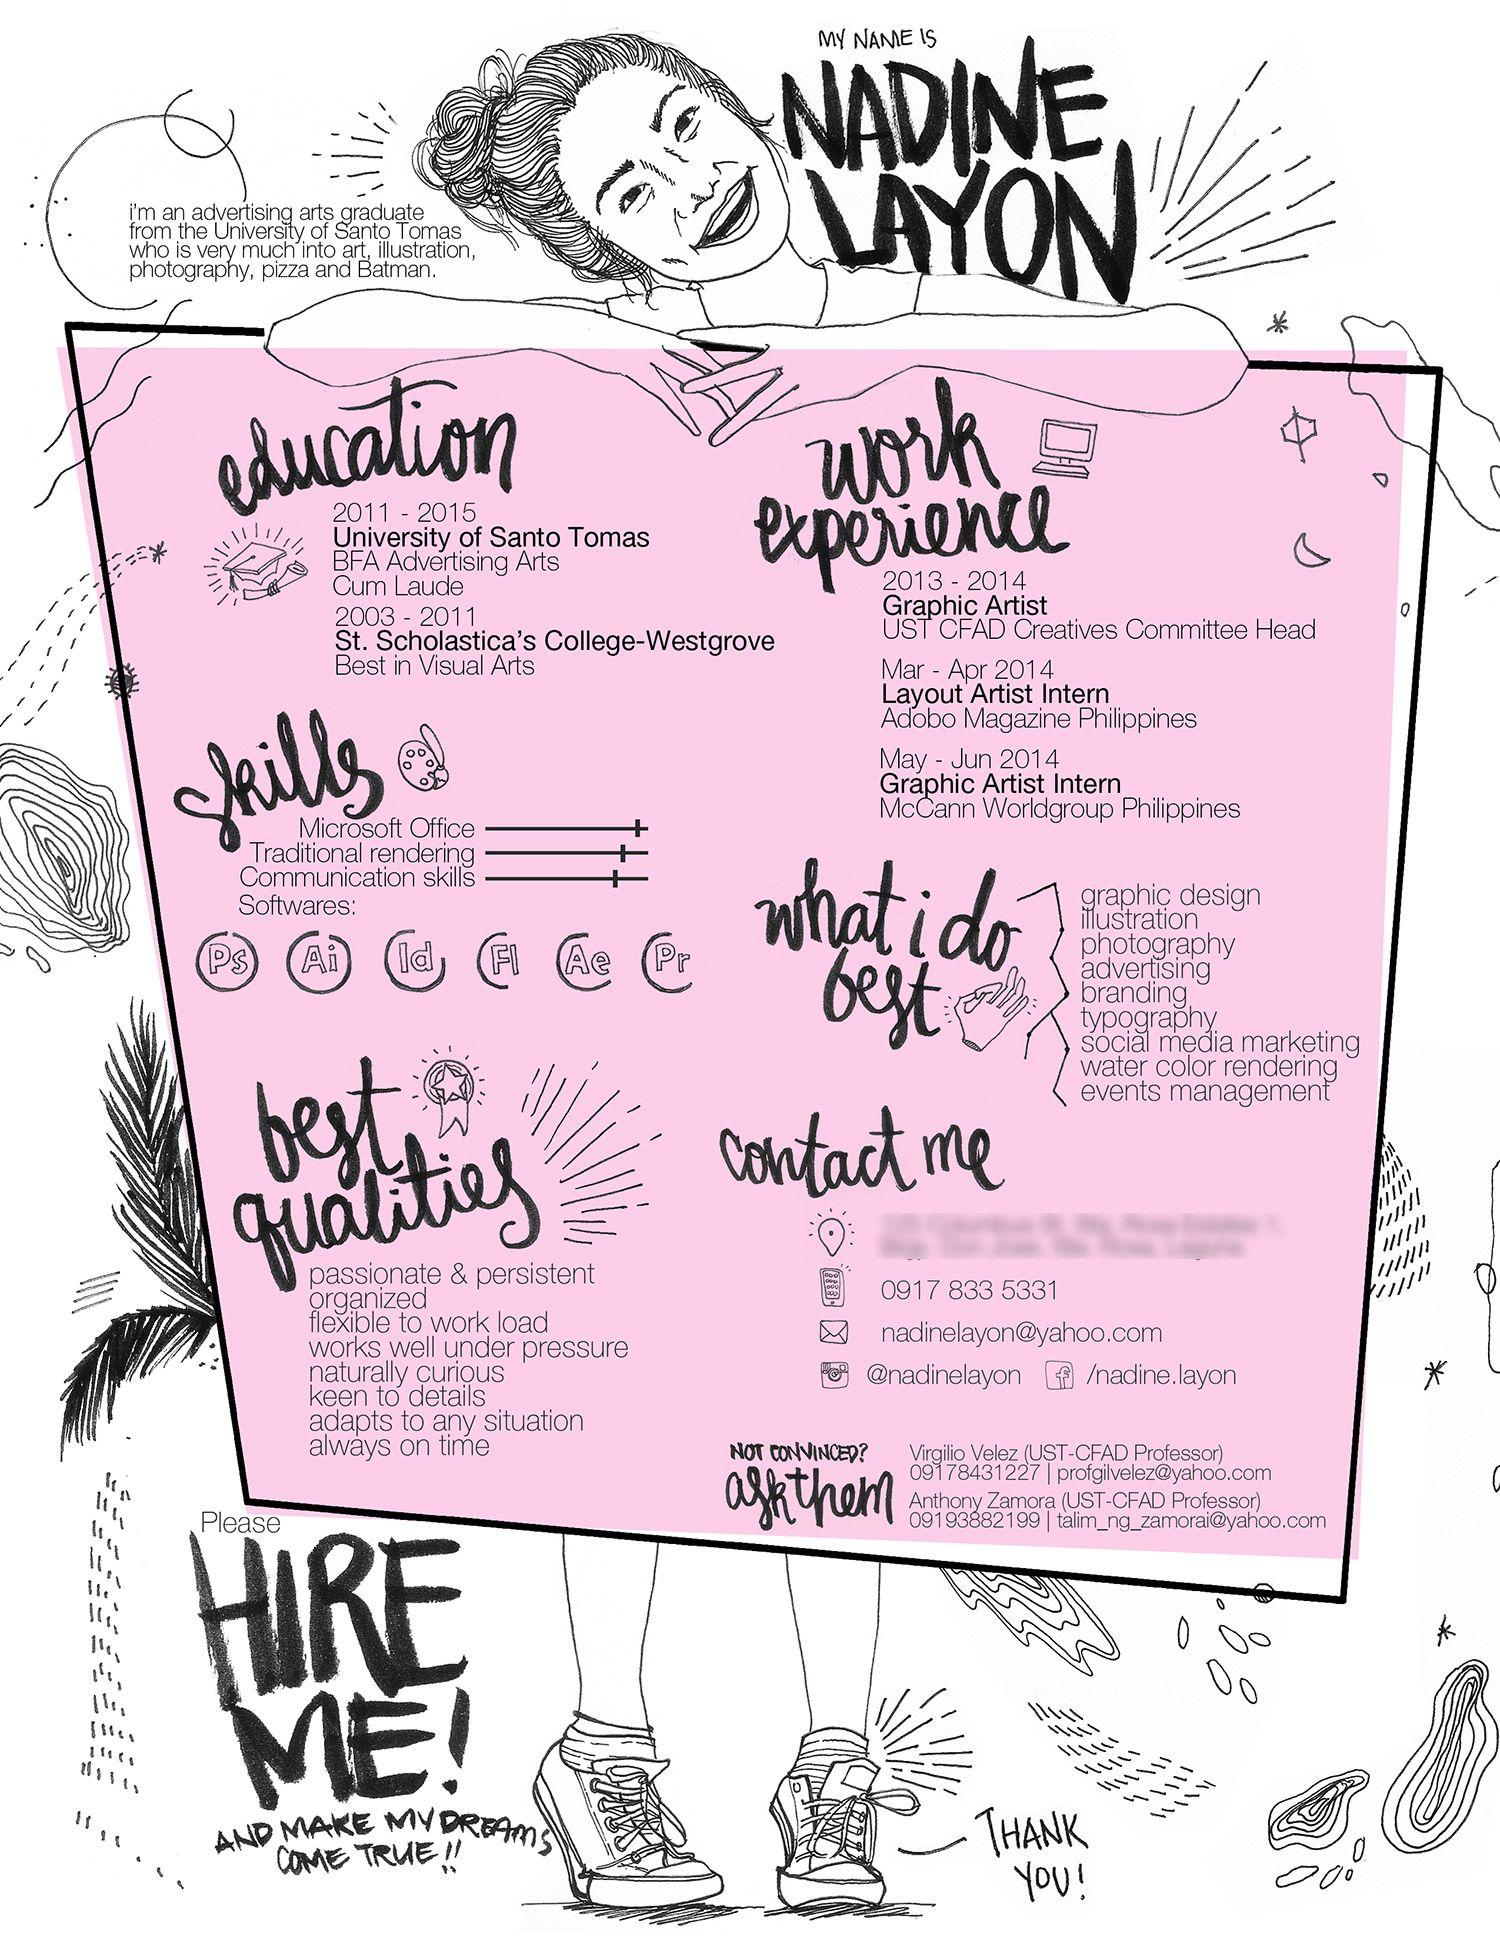 25 Creative And Beautiful Resume & CV Examples Cv